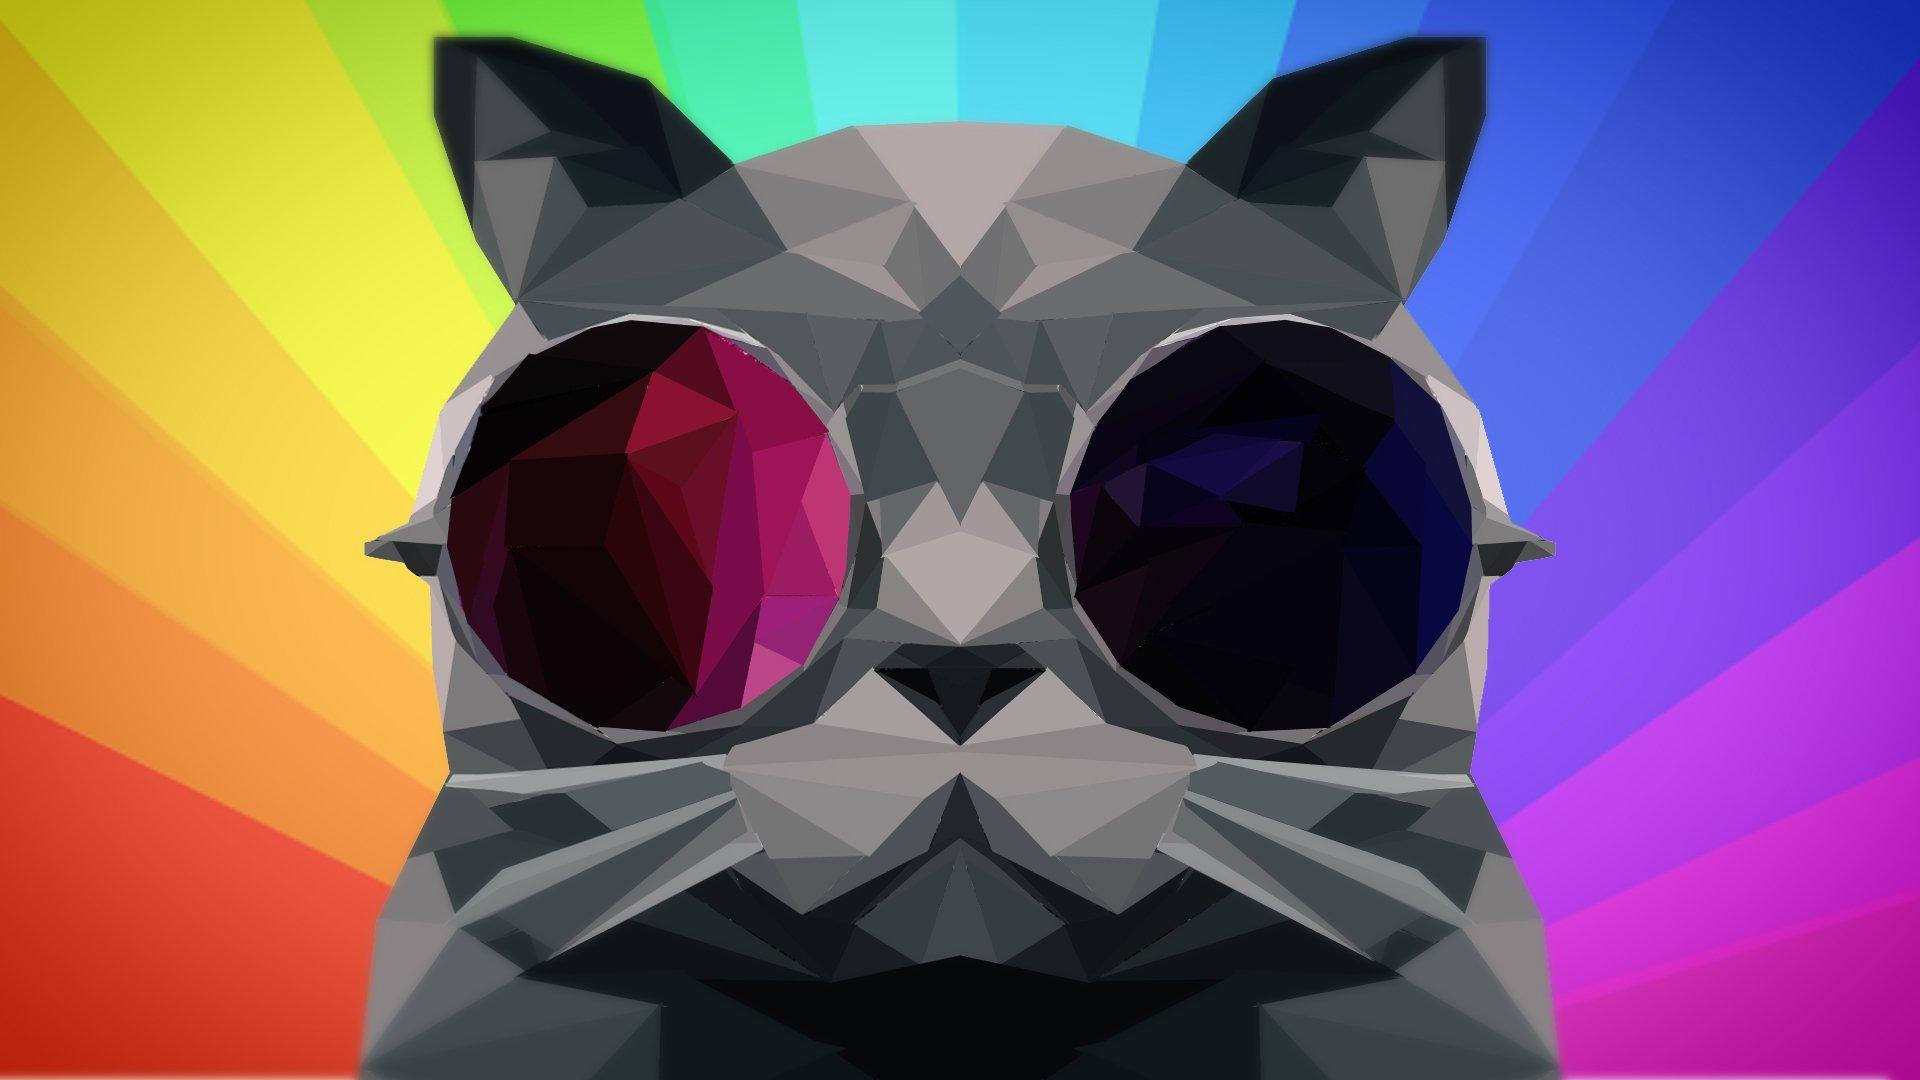 rainbow cat wallpapers - photo #29